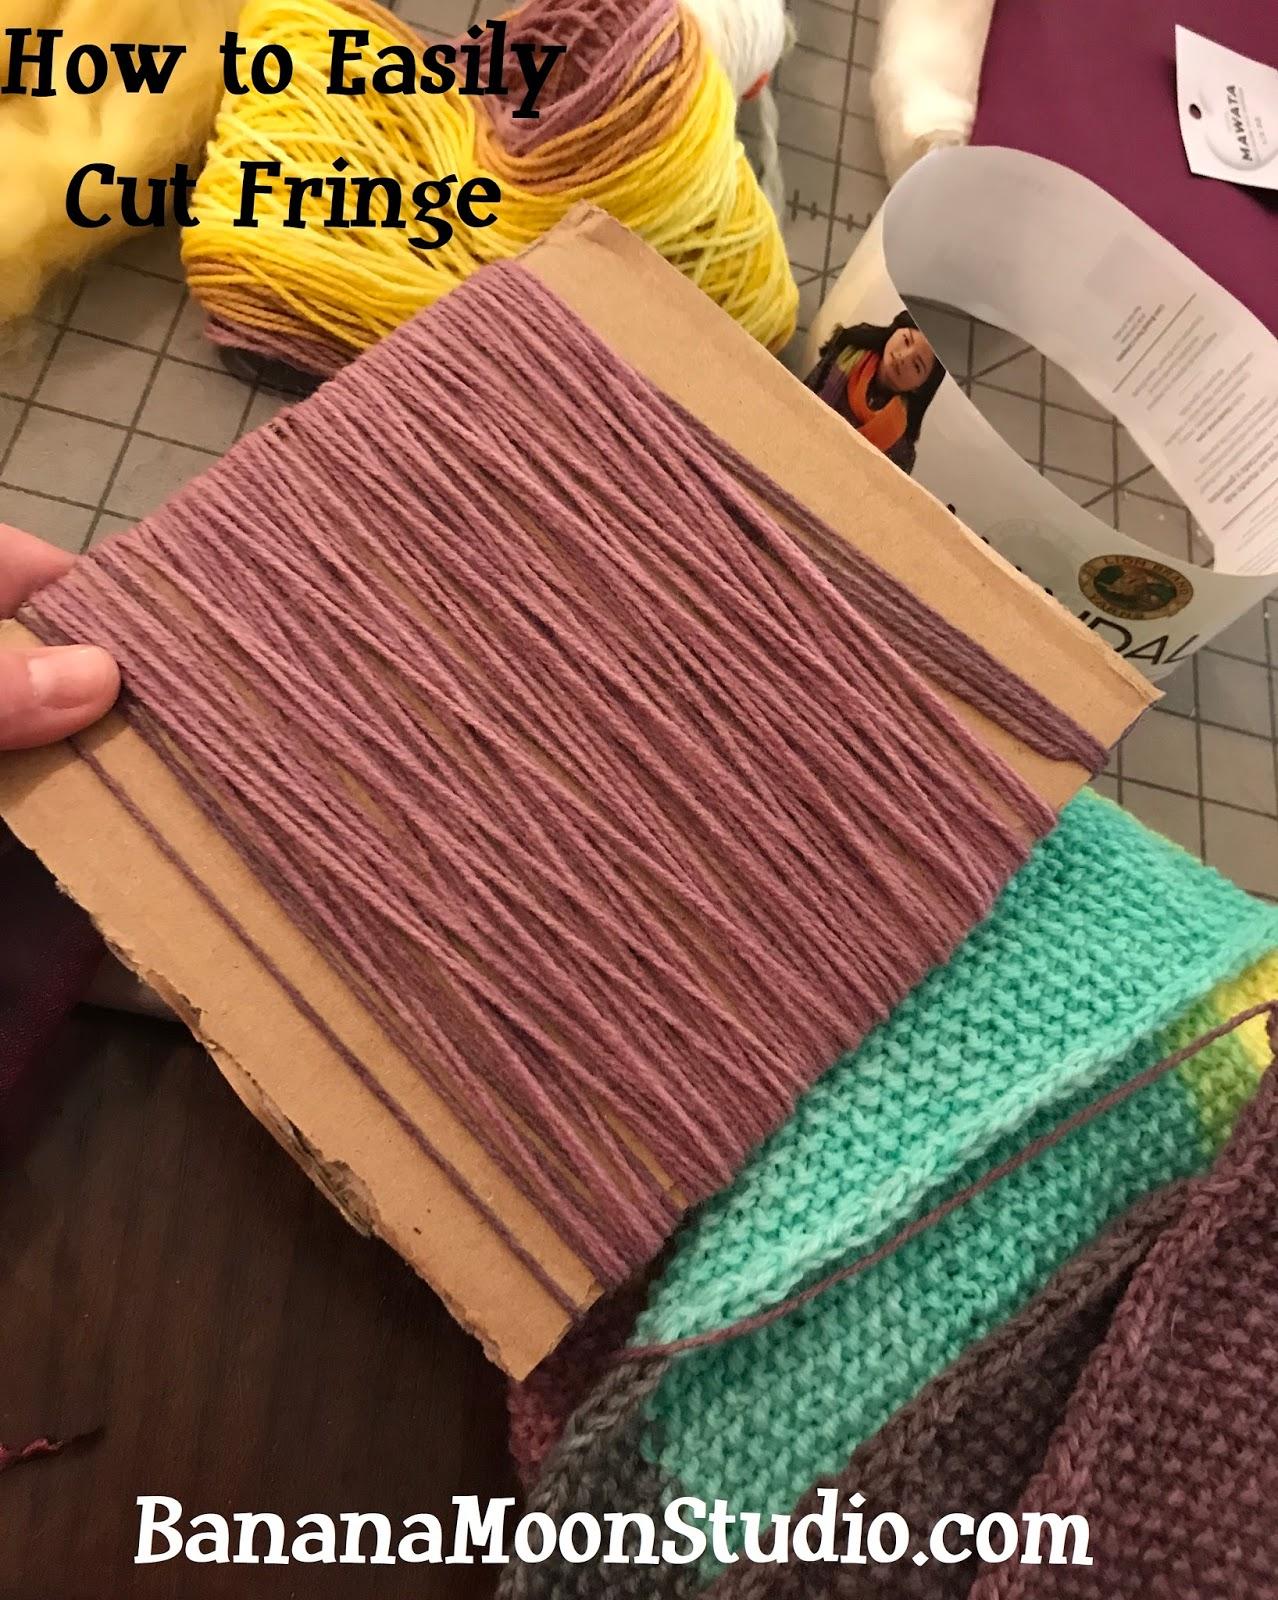 how to make fringe for a crochet or knitting project banana moon studio  rh   bananamoonstudio blogspot